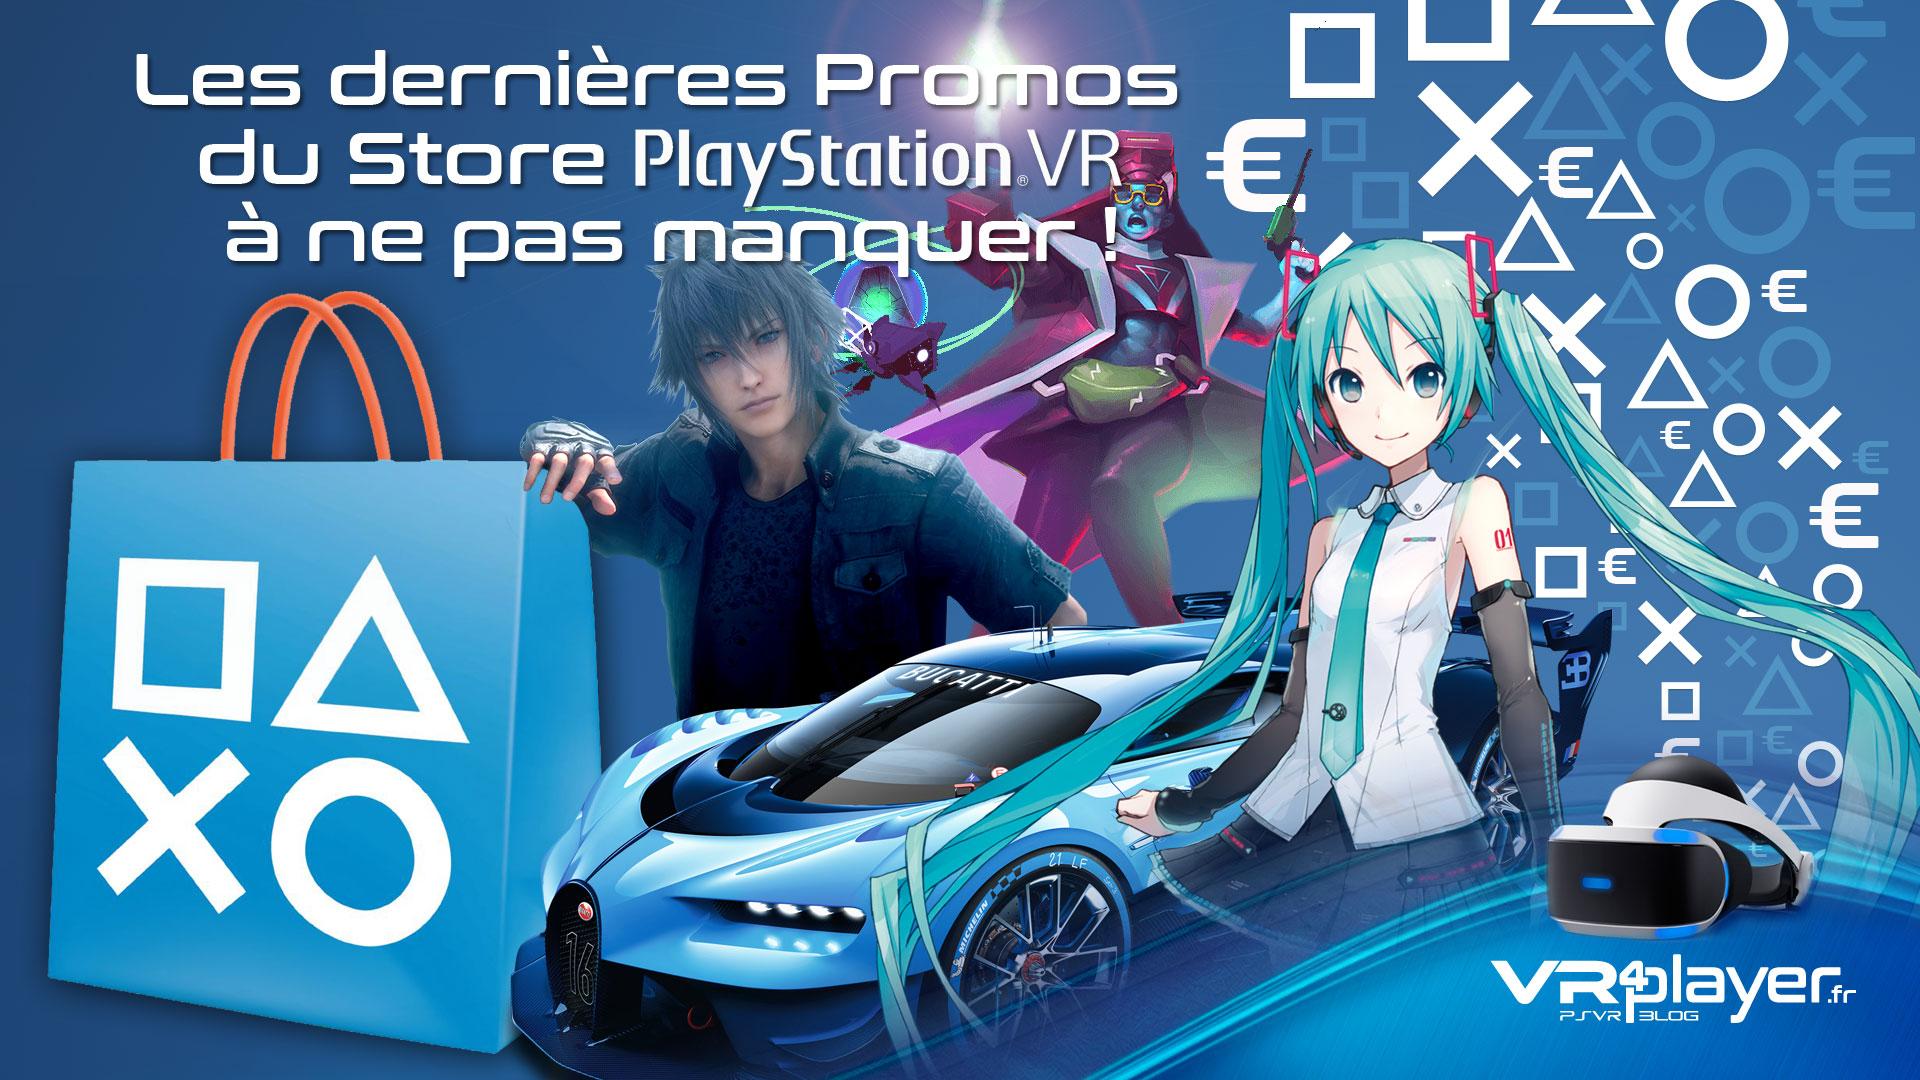 promos de mai sur PlayStation VR vrplayer.fr